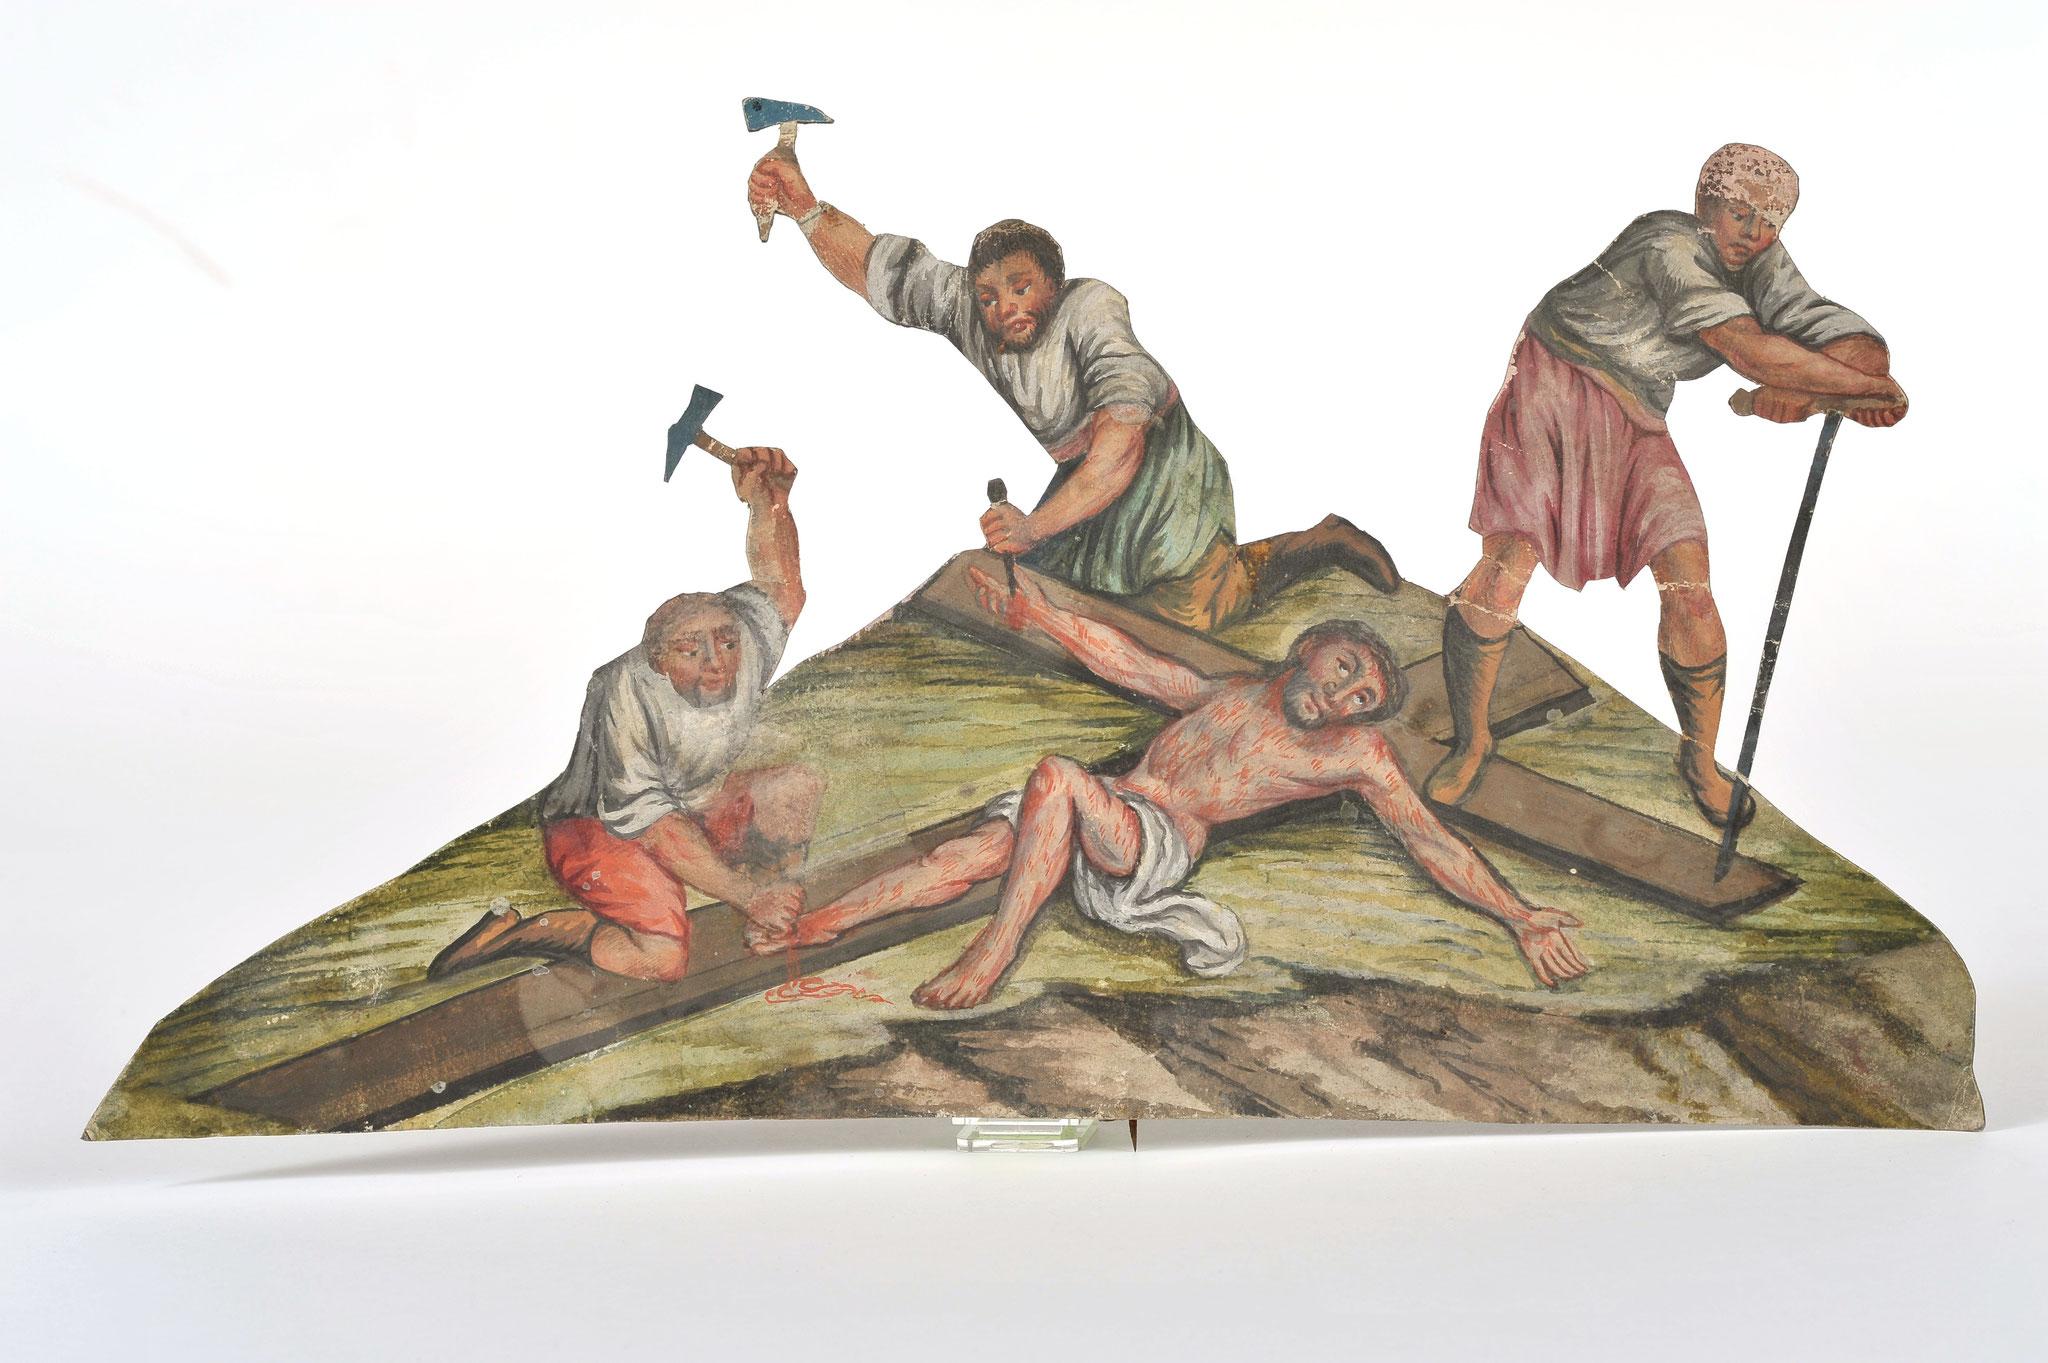 Fastenkrippe aus Thaur, Papier, Mitte 19. Jh. - Fotonachweis Tiroler Landesmuseen/Volkskunstmuseum